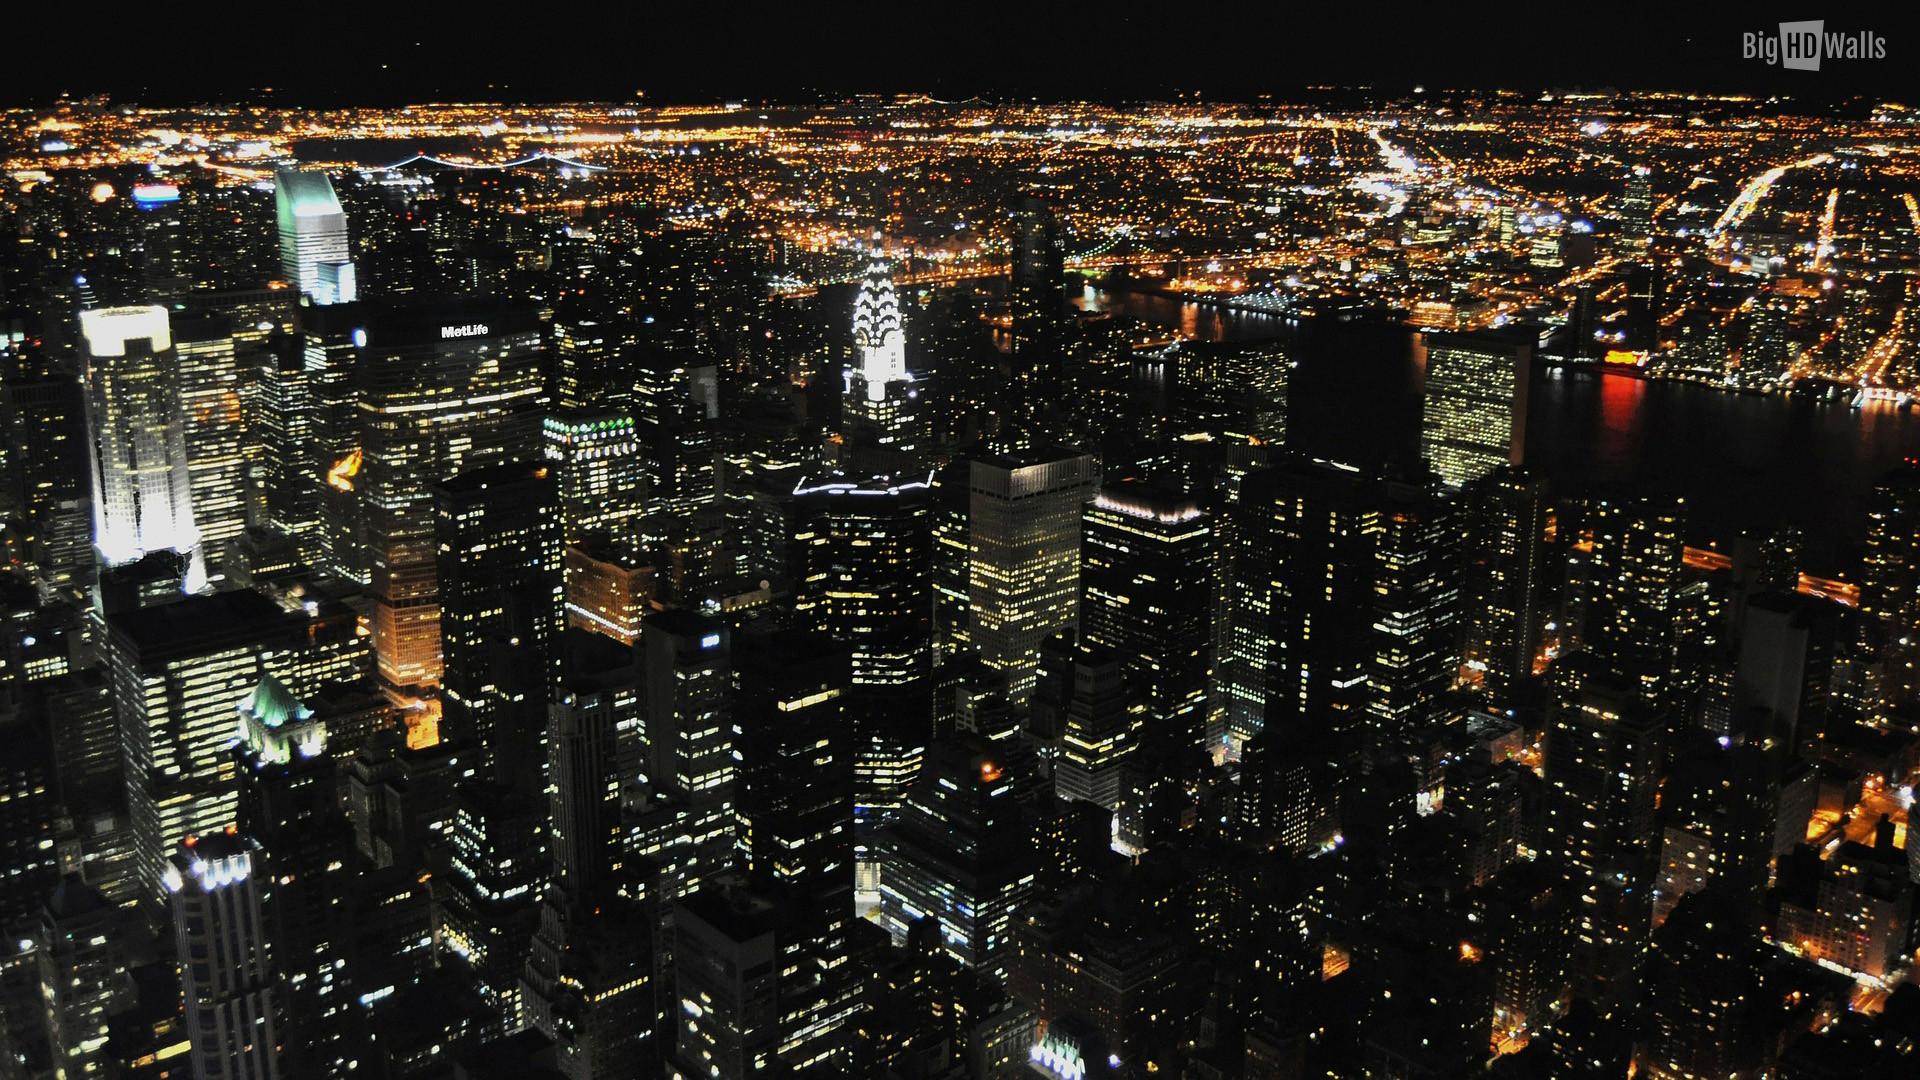 city lights at night NYC